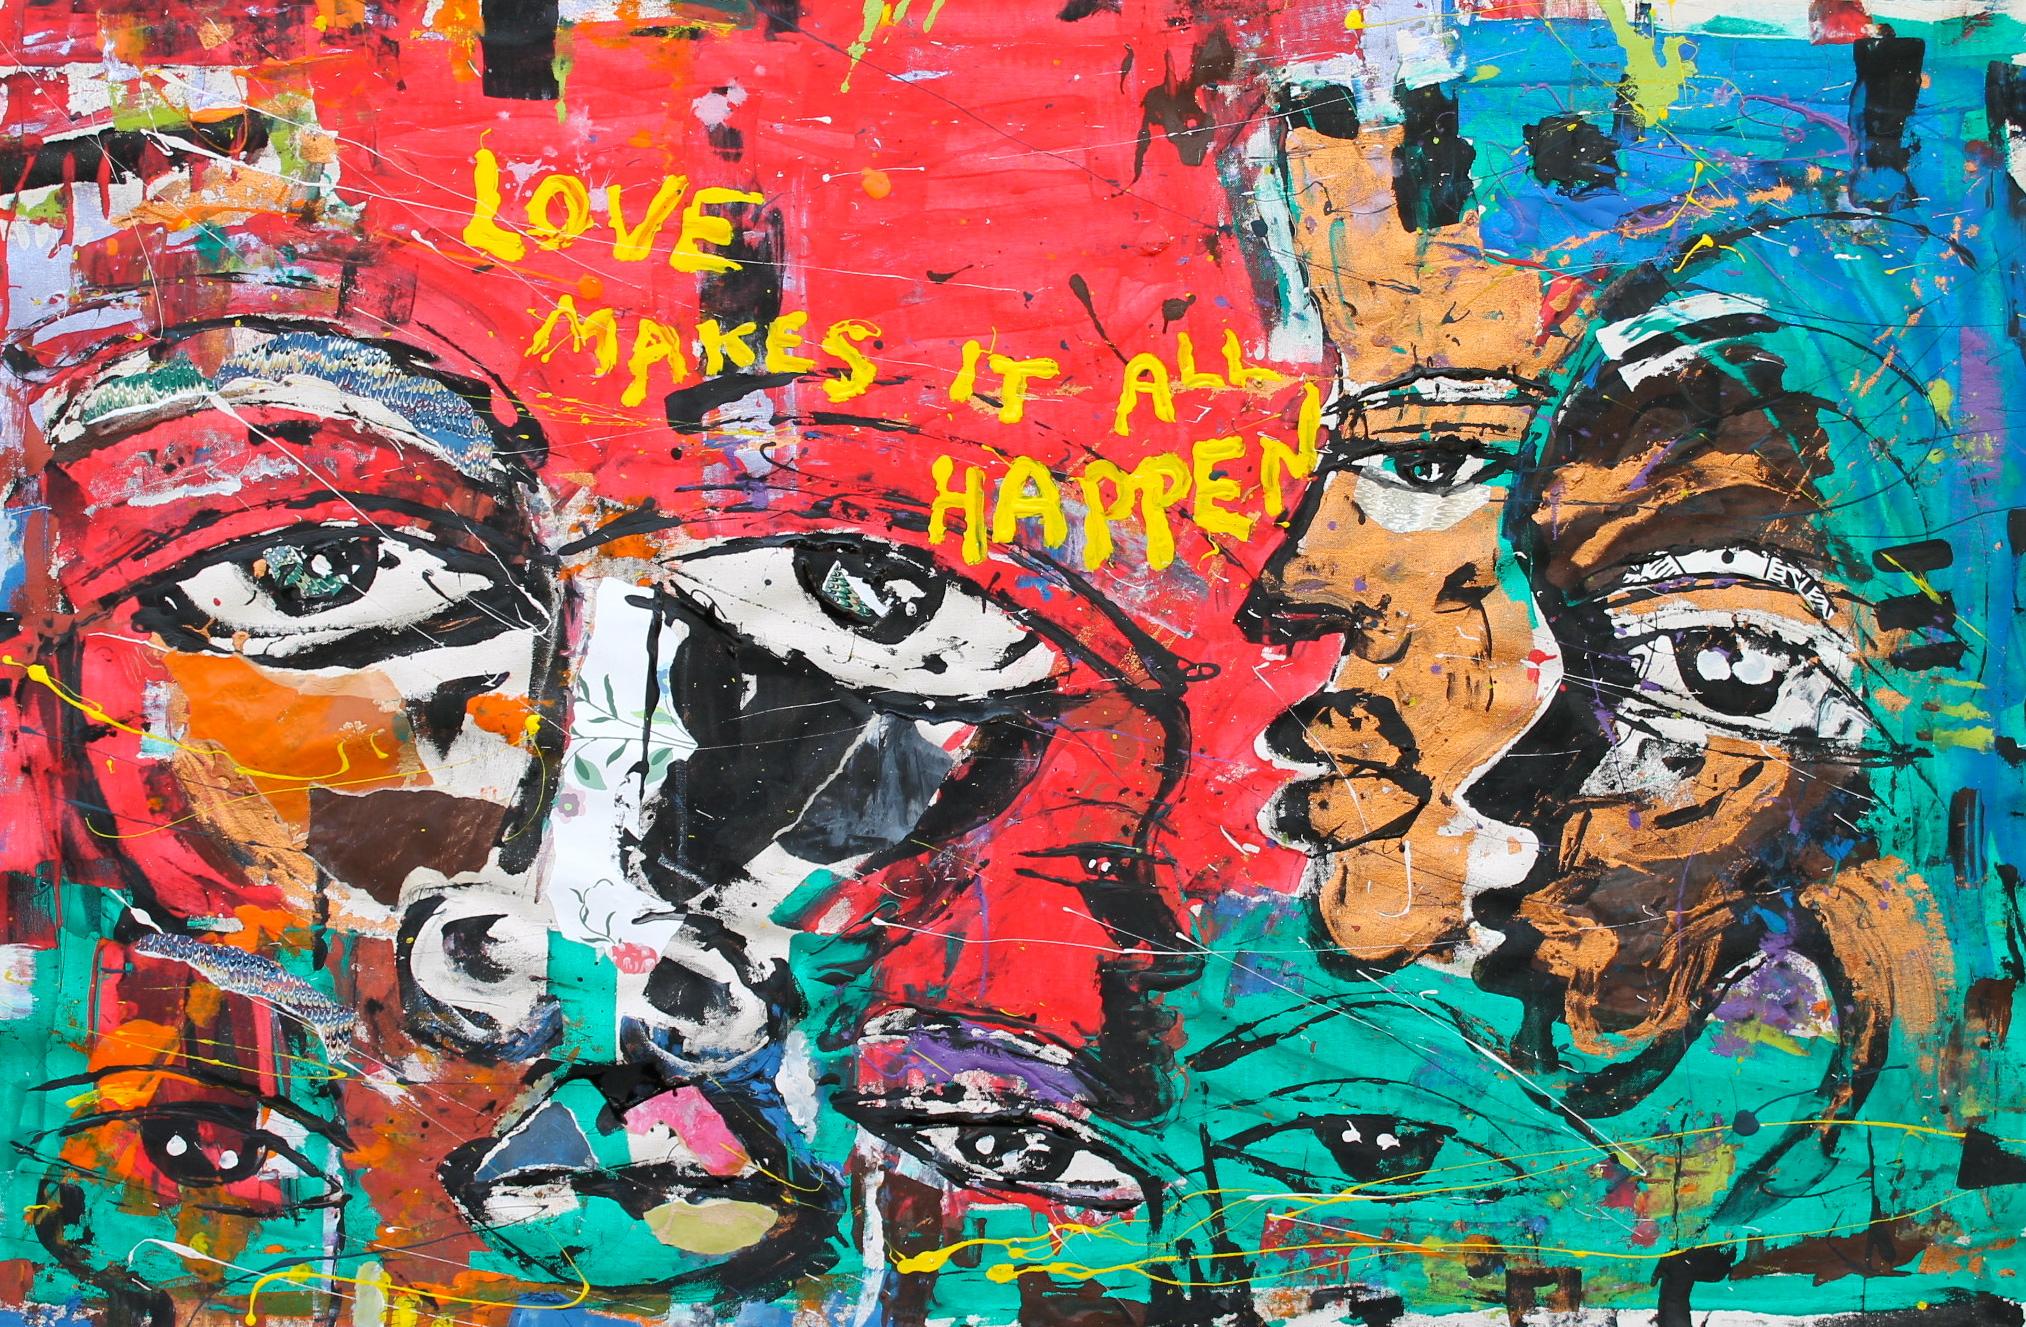 Miles regis love makes it all happen 28 x 44